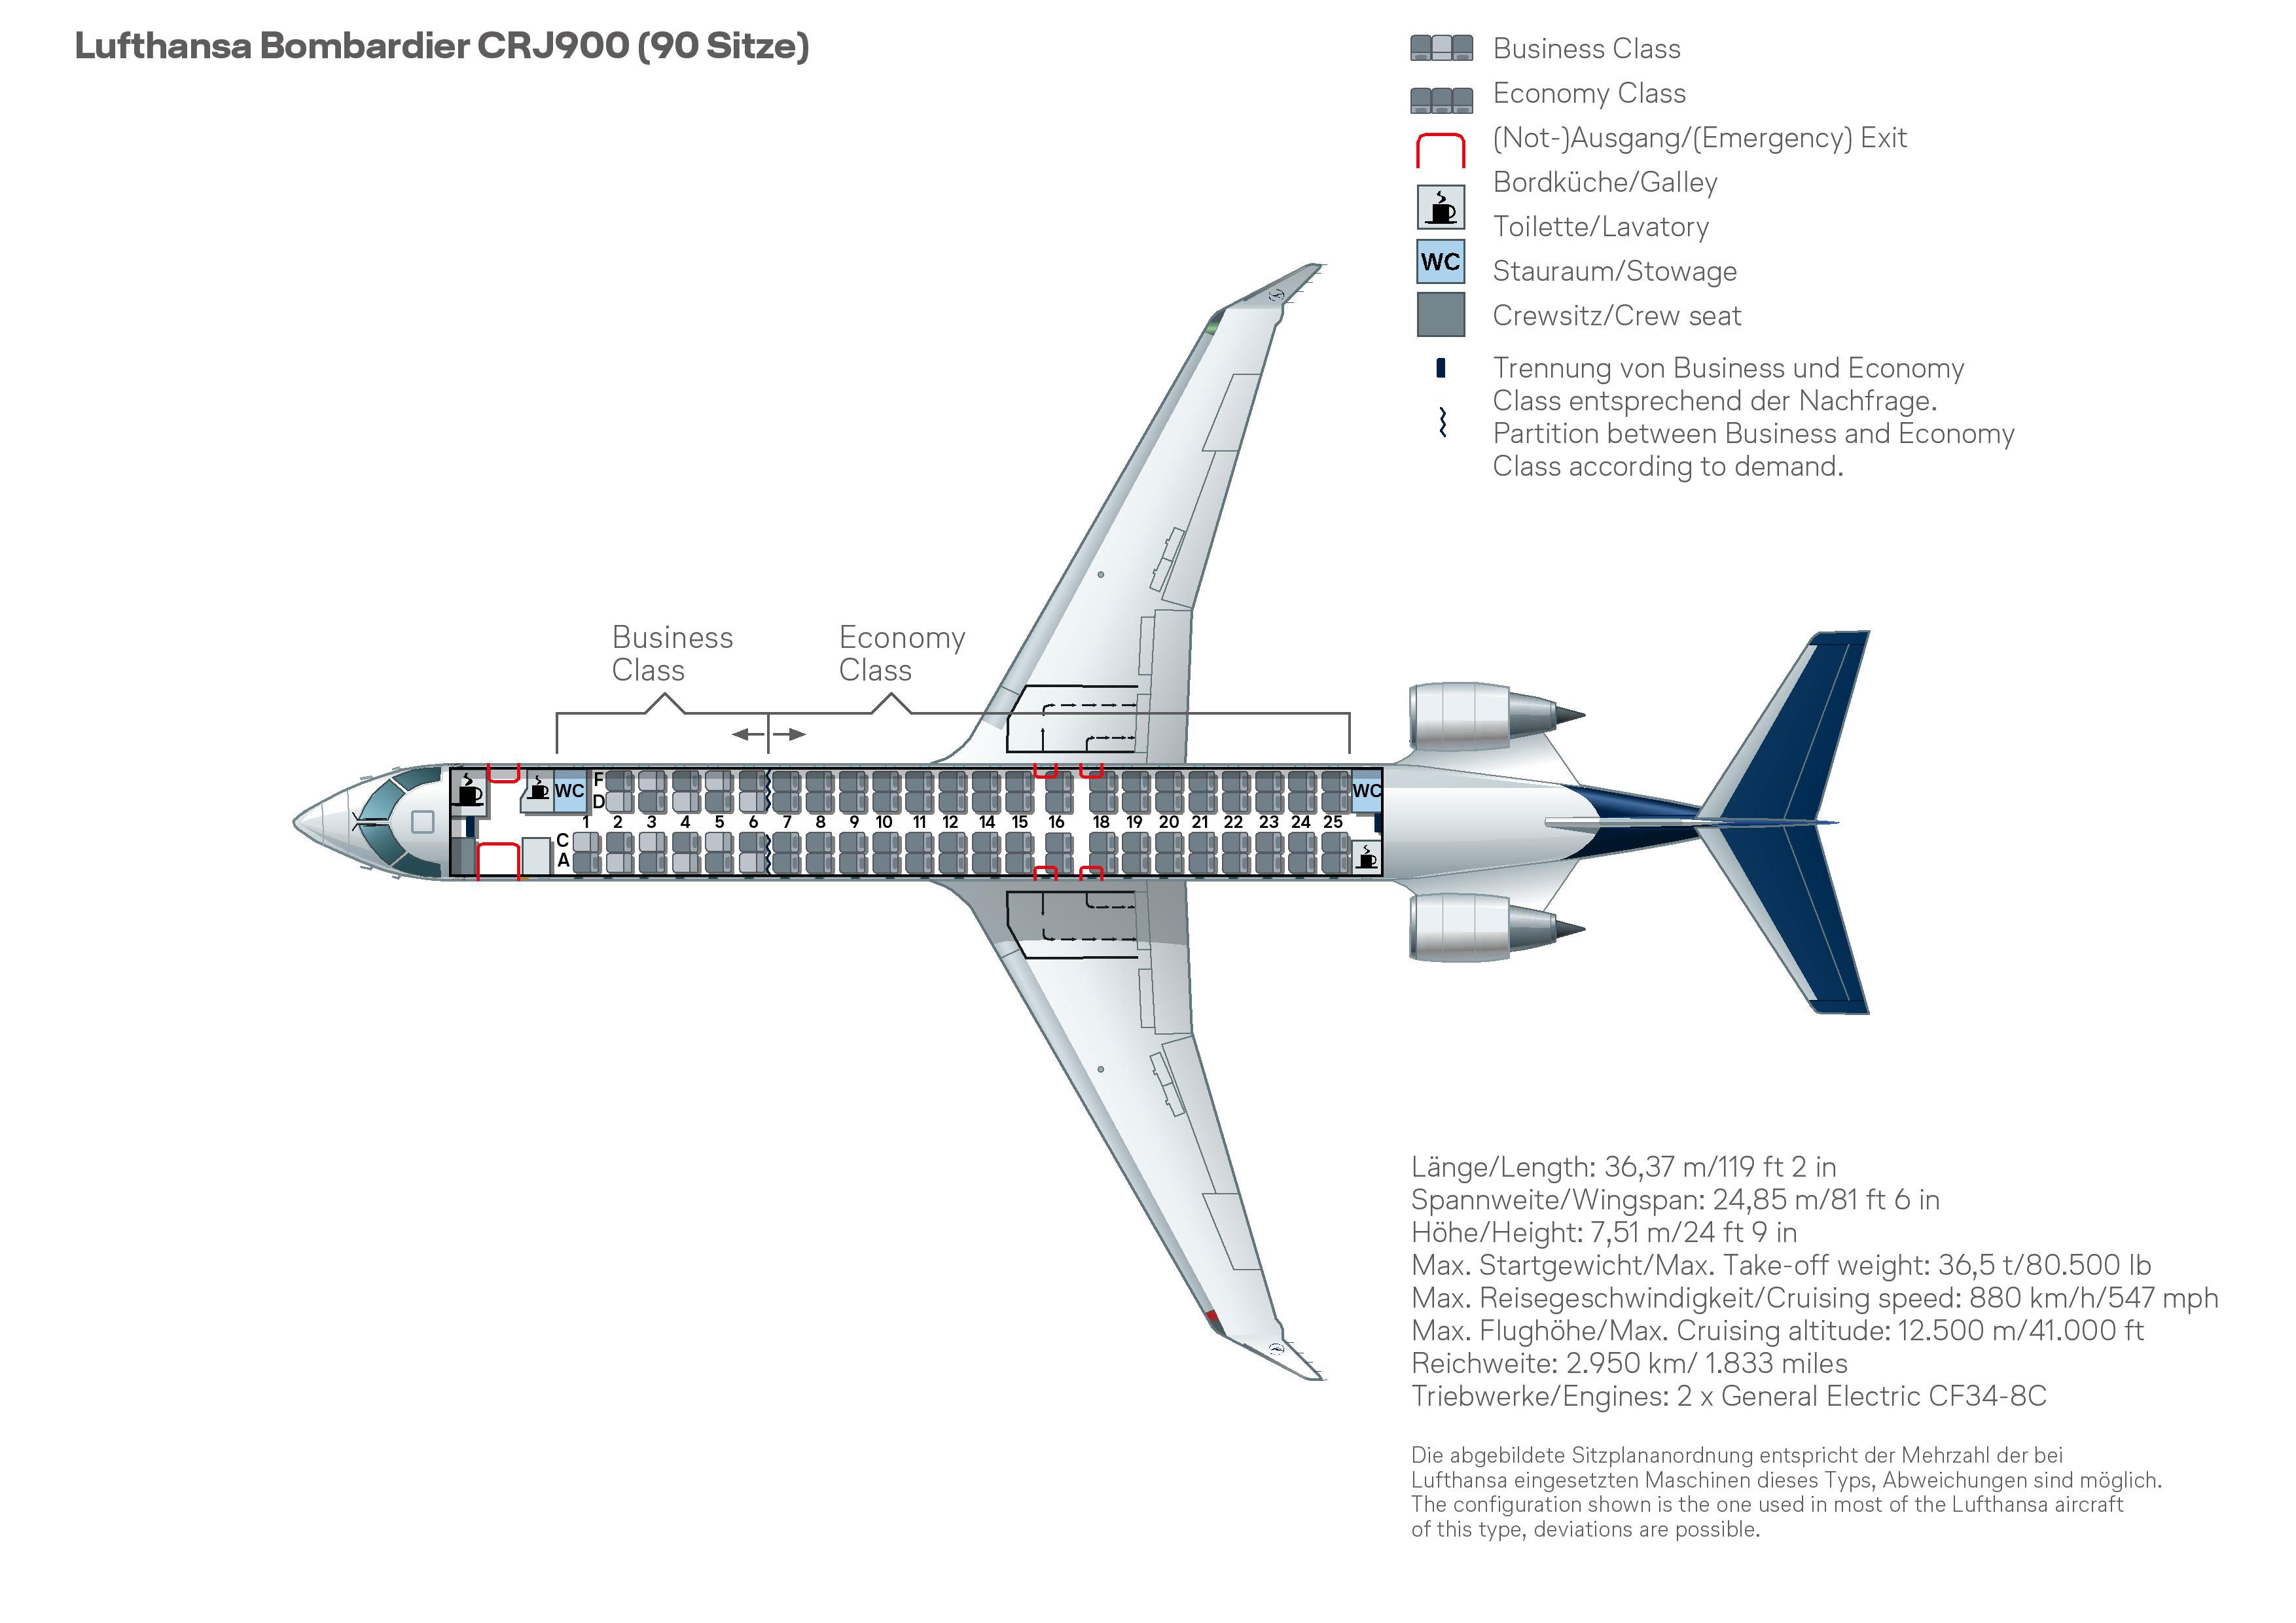 Bombardier-CRJ900-plane-placing-Lufthansa